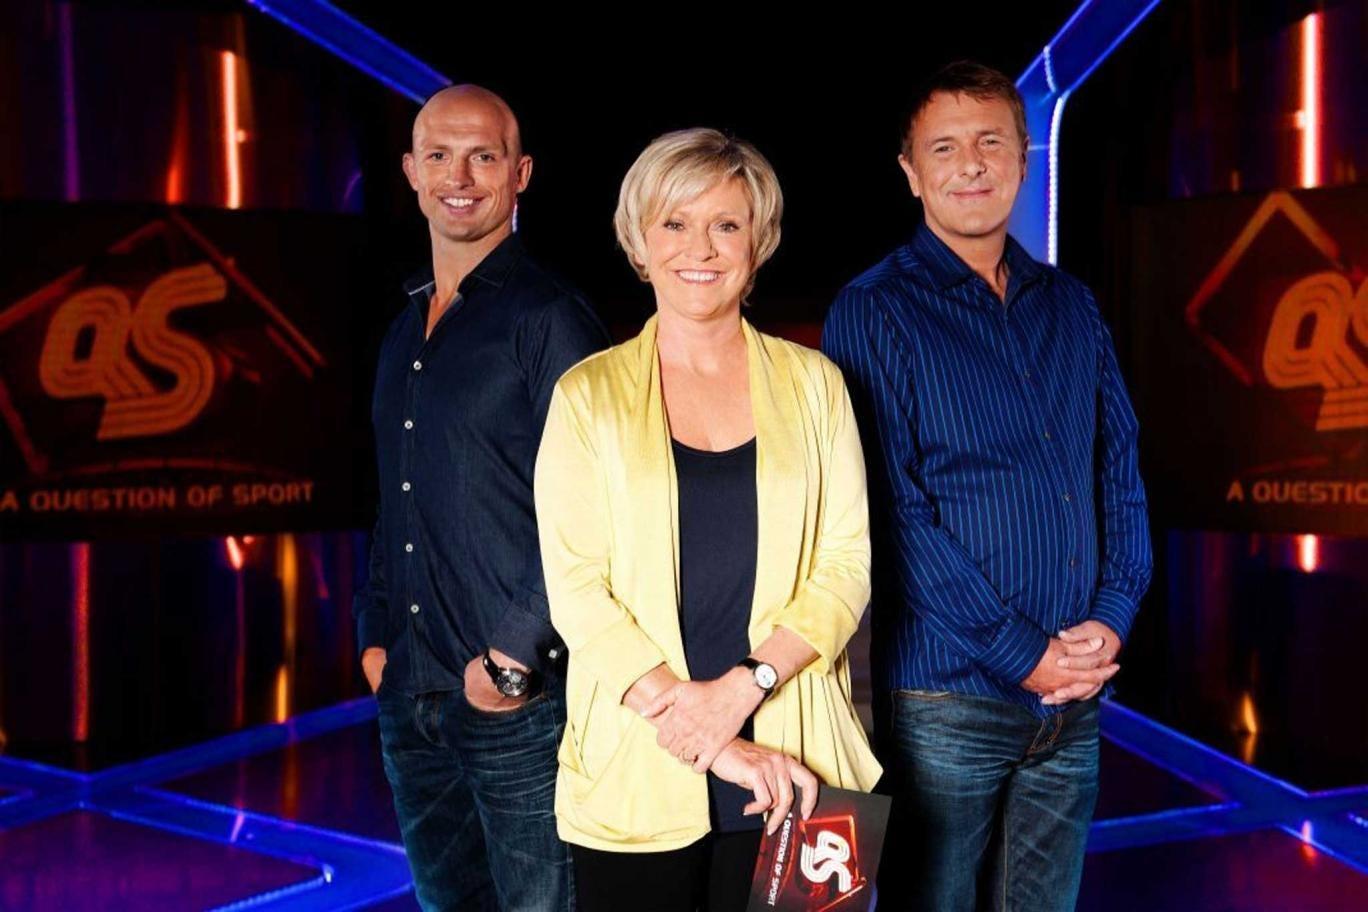 Question of Sport presenter Sue Barker with team captains Matt Dawson (left) and Phil Tufnell